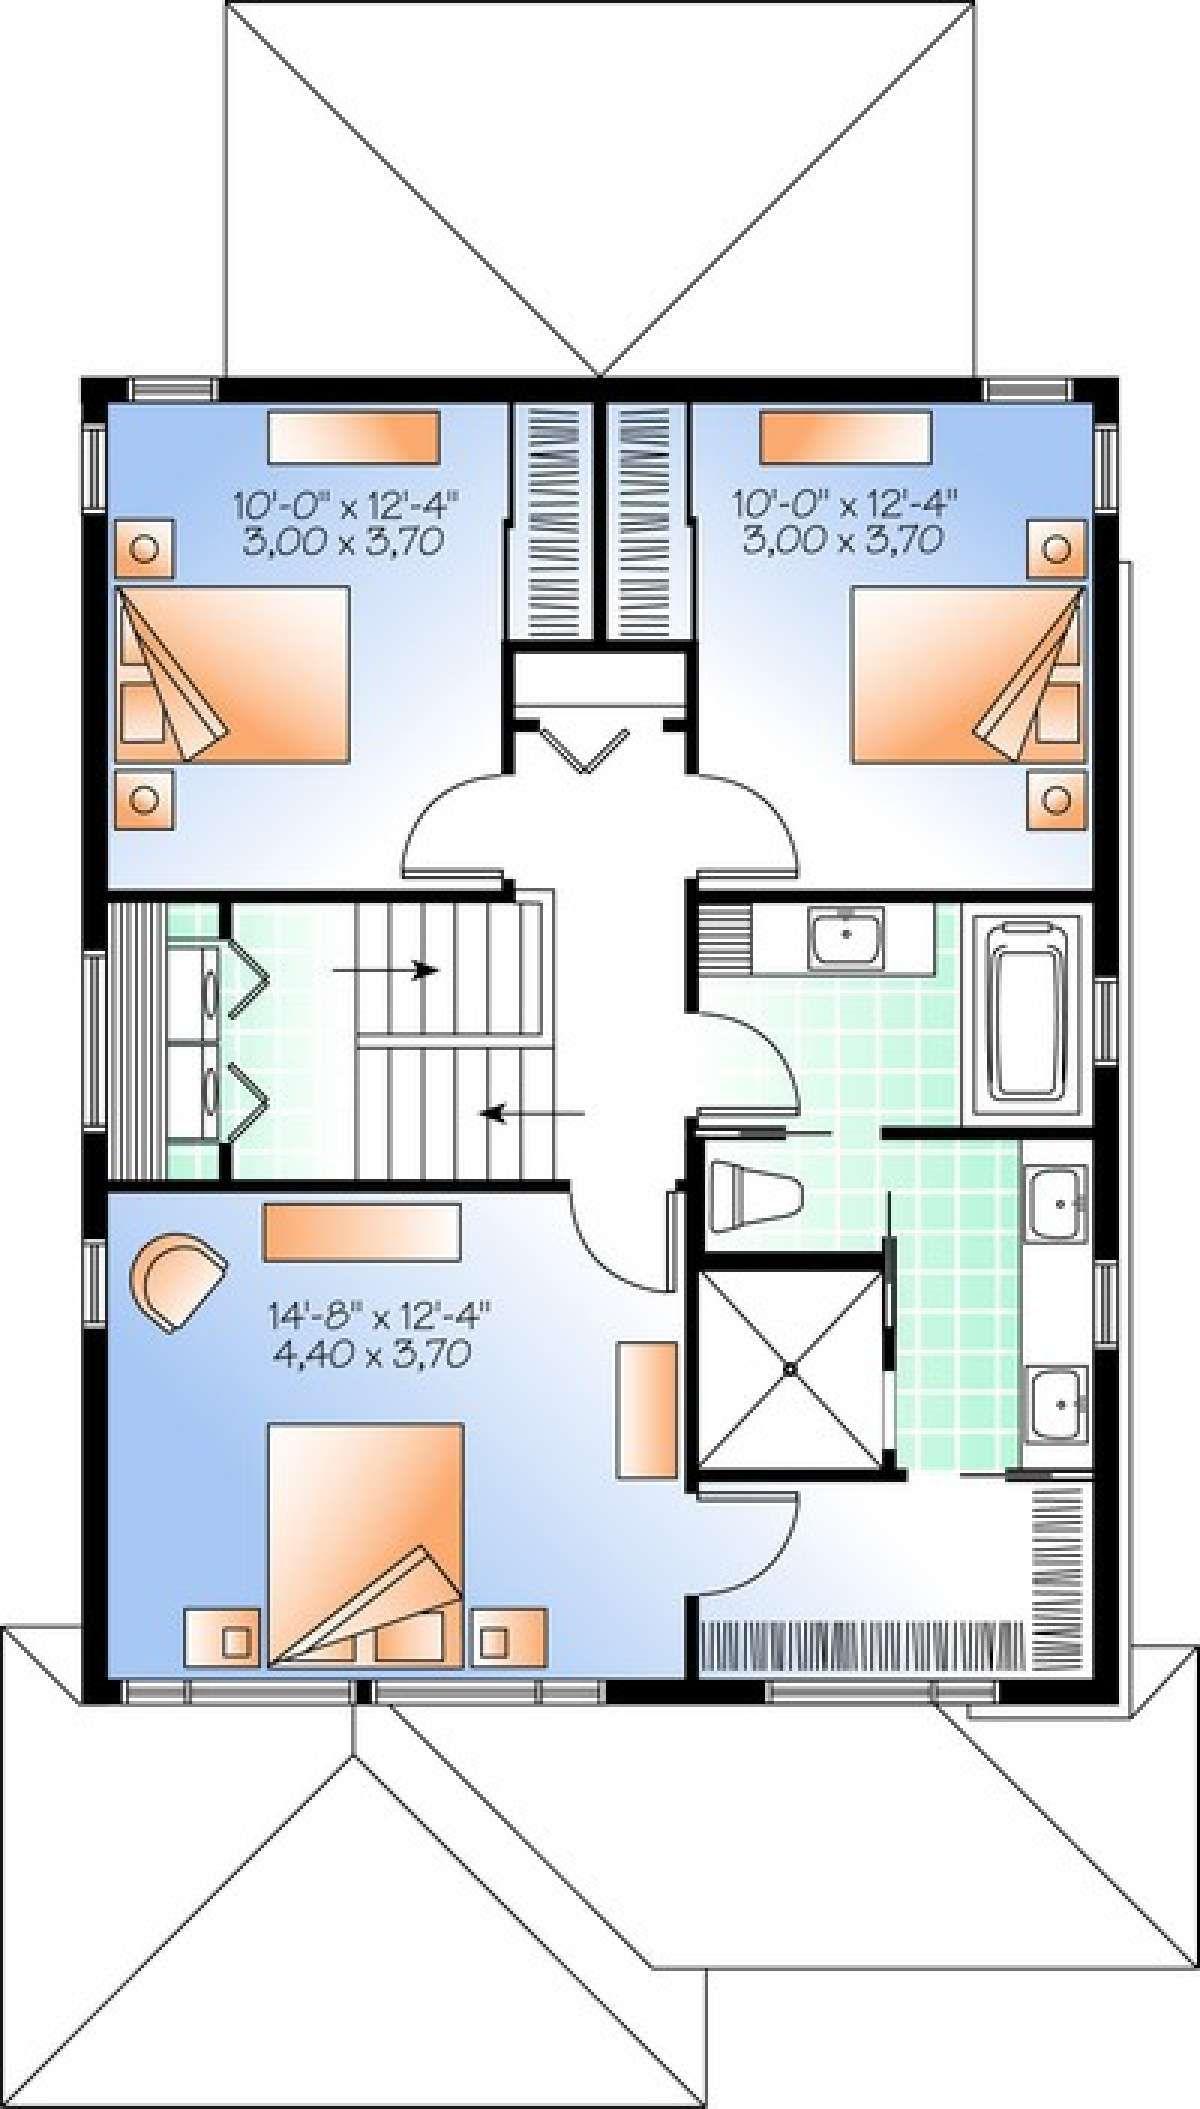 House Plan 034 01034 Narrow Lot Plan 1 617 Square Feet 3 Bedrooms 2 5 Bathrooms House Plans Narrow Lot House Plans Floor Plans